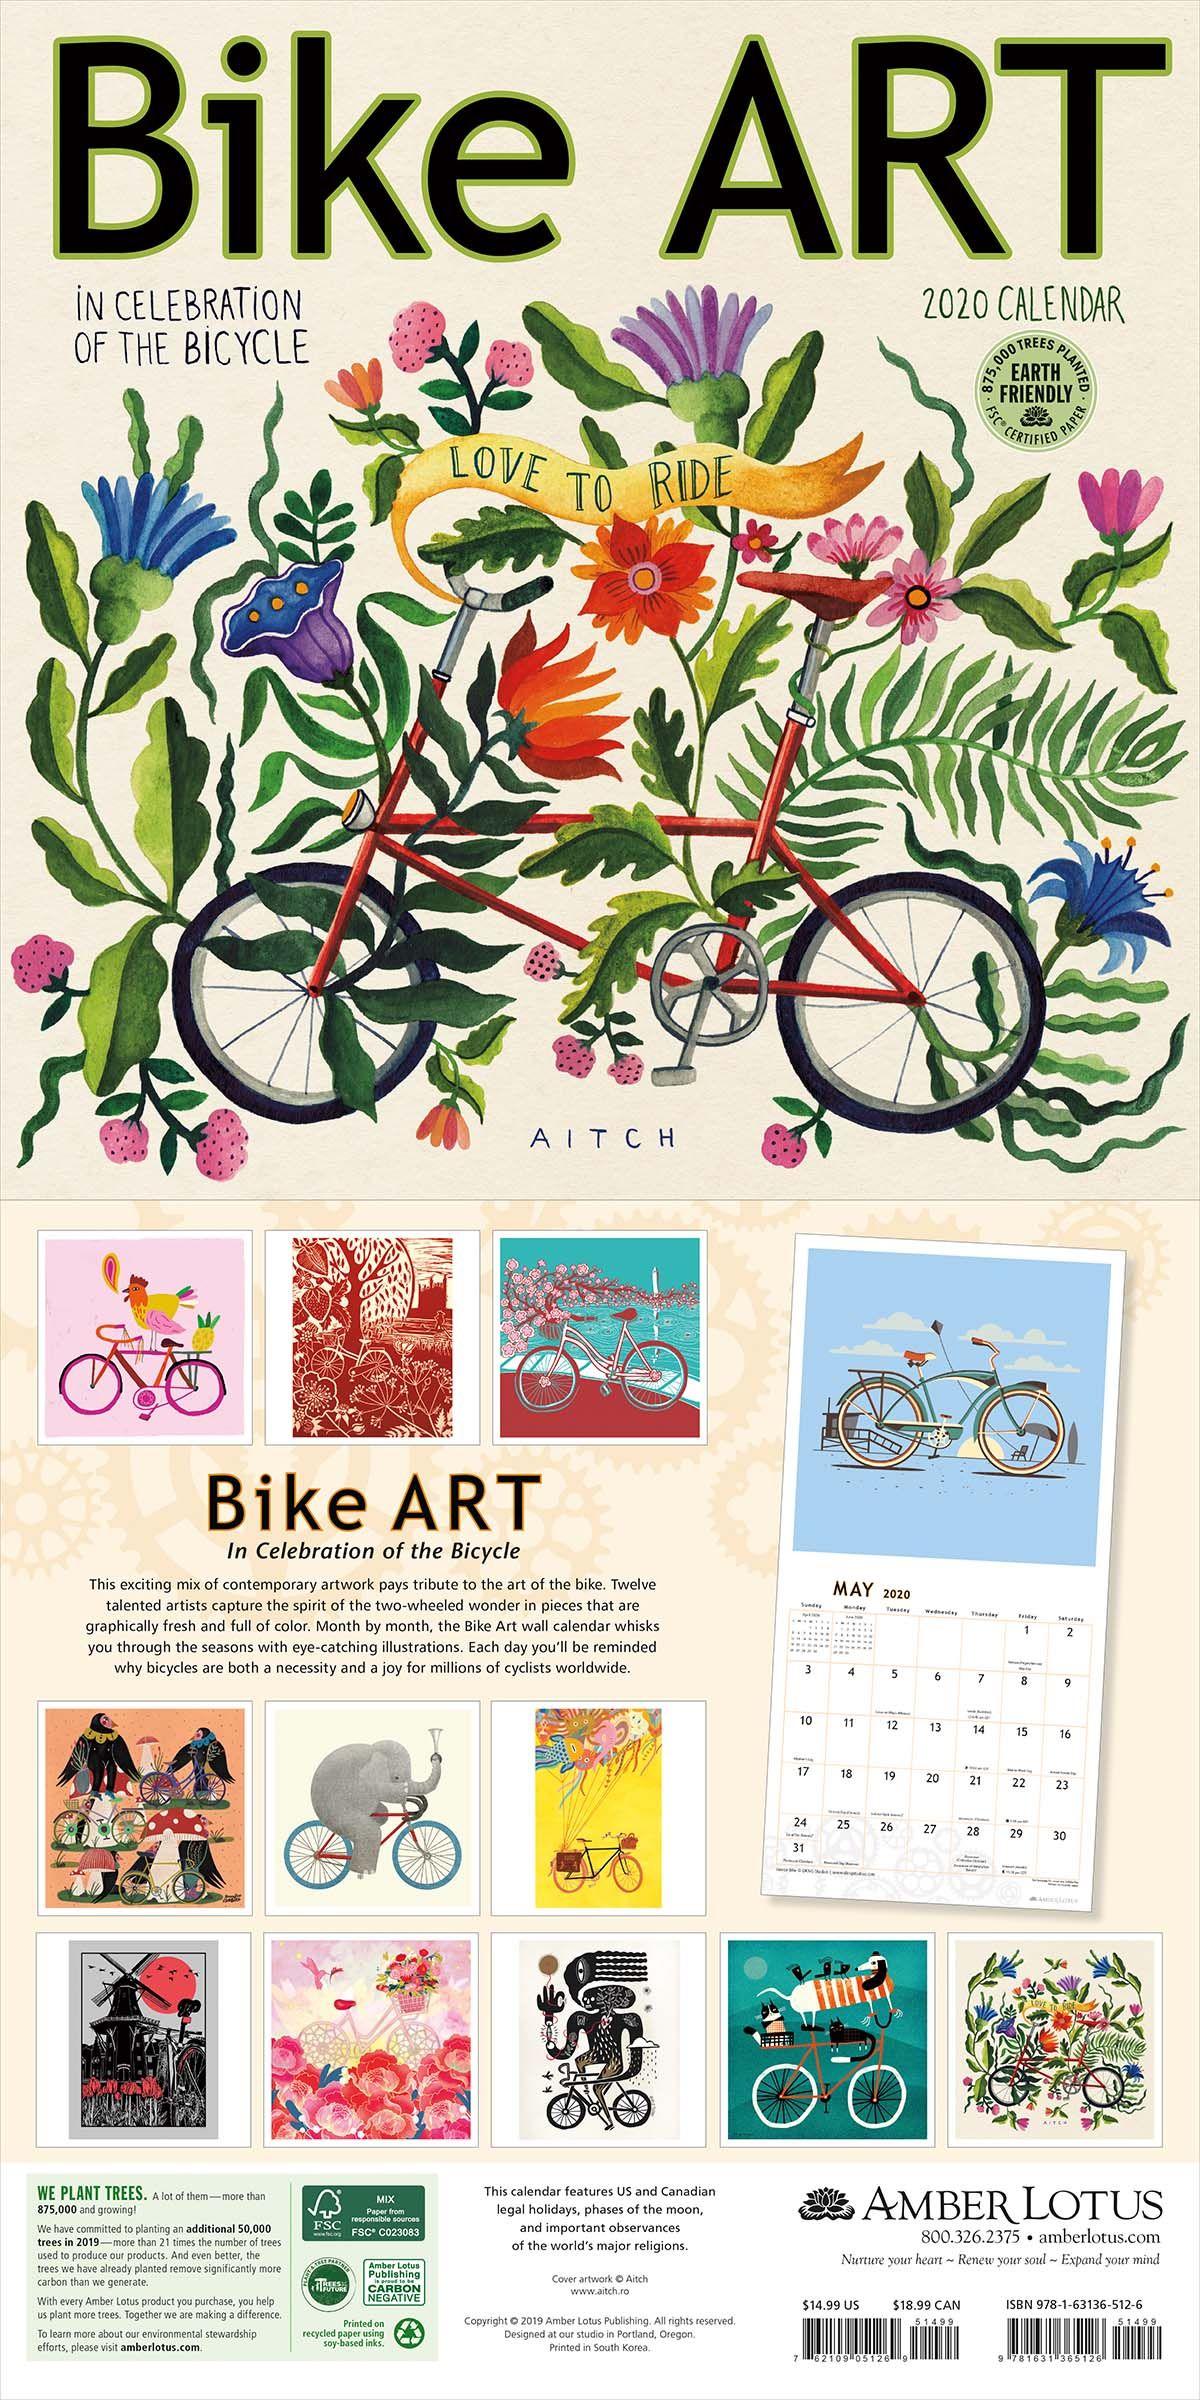 Bike Art 2020 Wall Calendar In Celebration Of The Bicycle Bike Art Wall Calendar Art